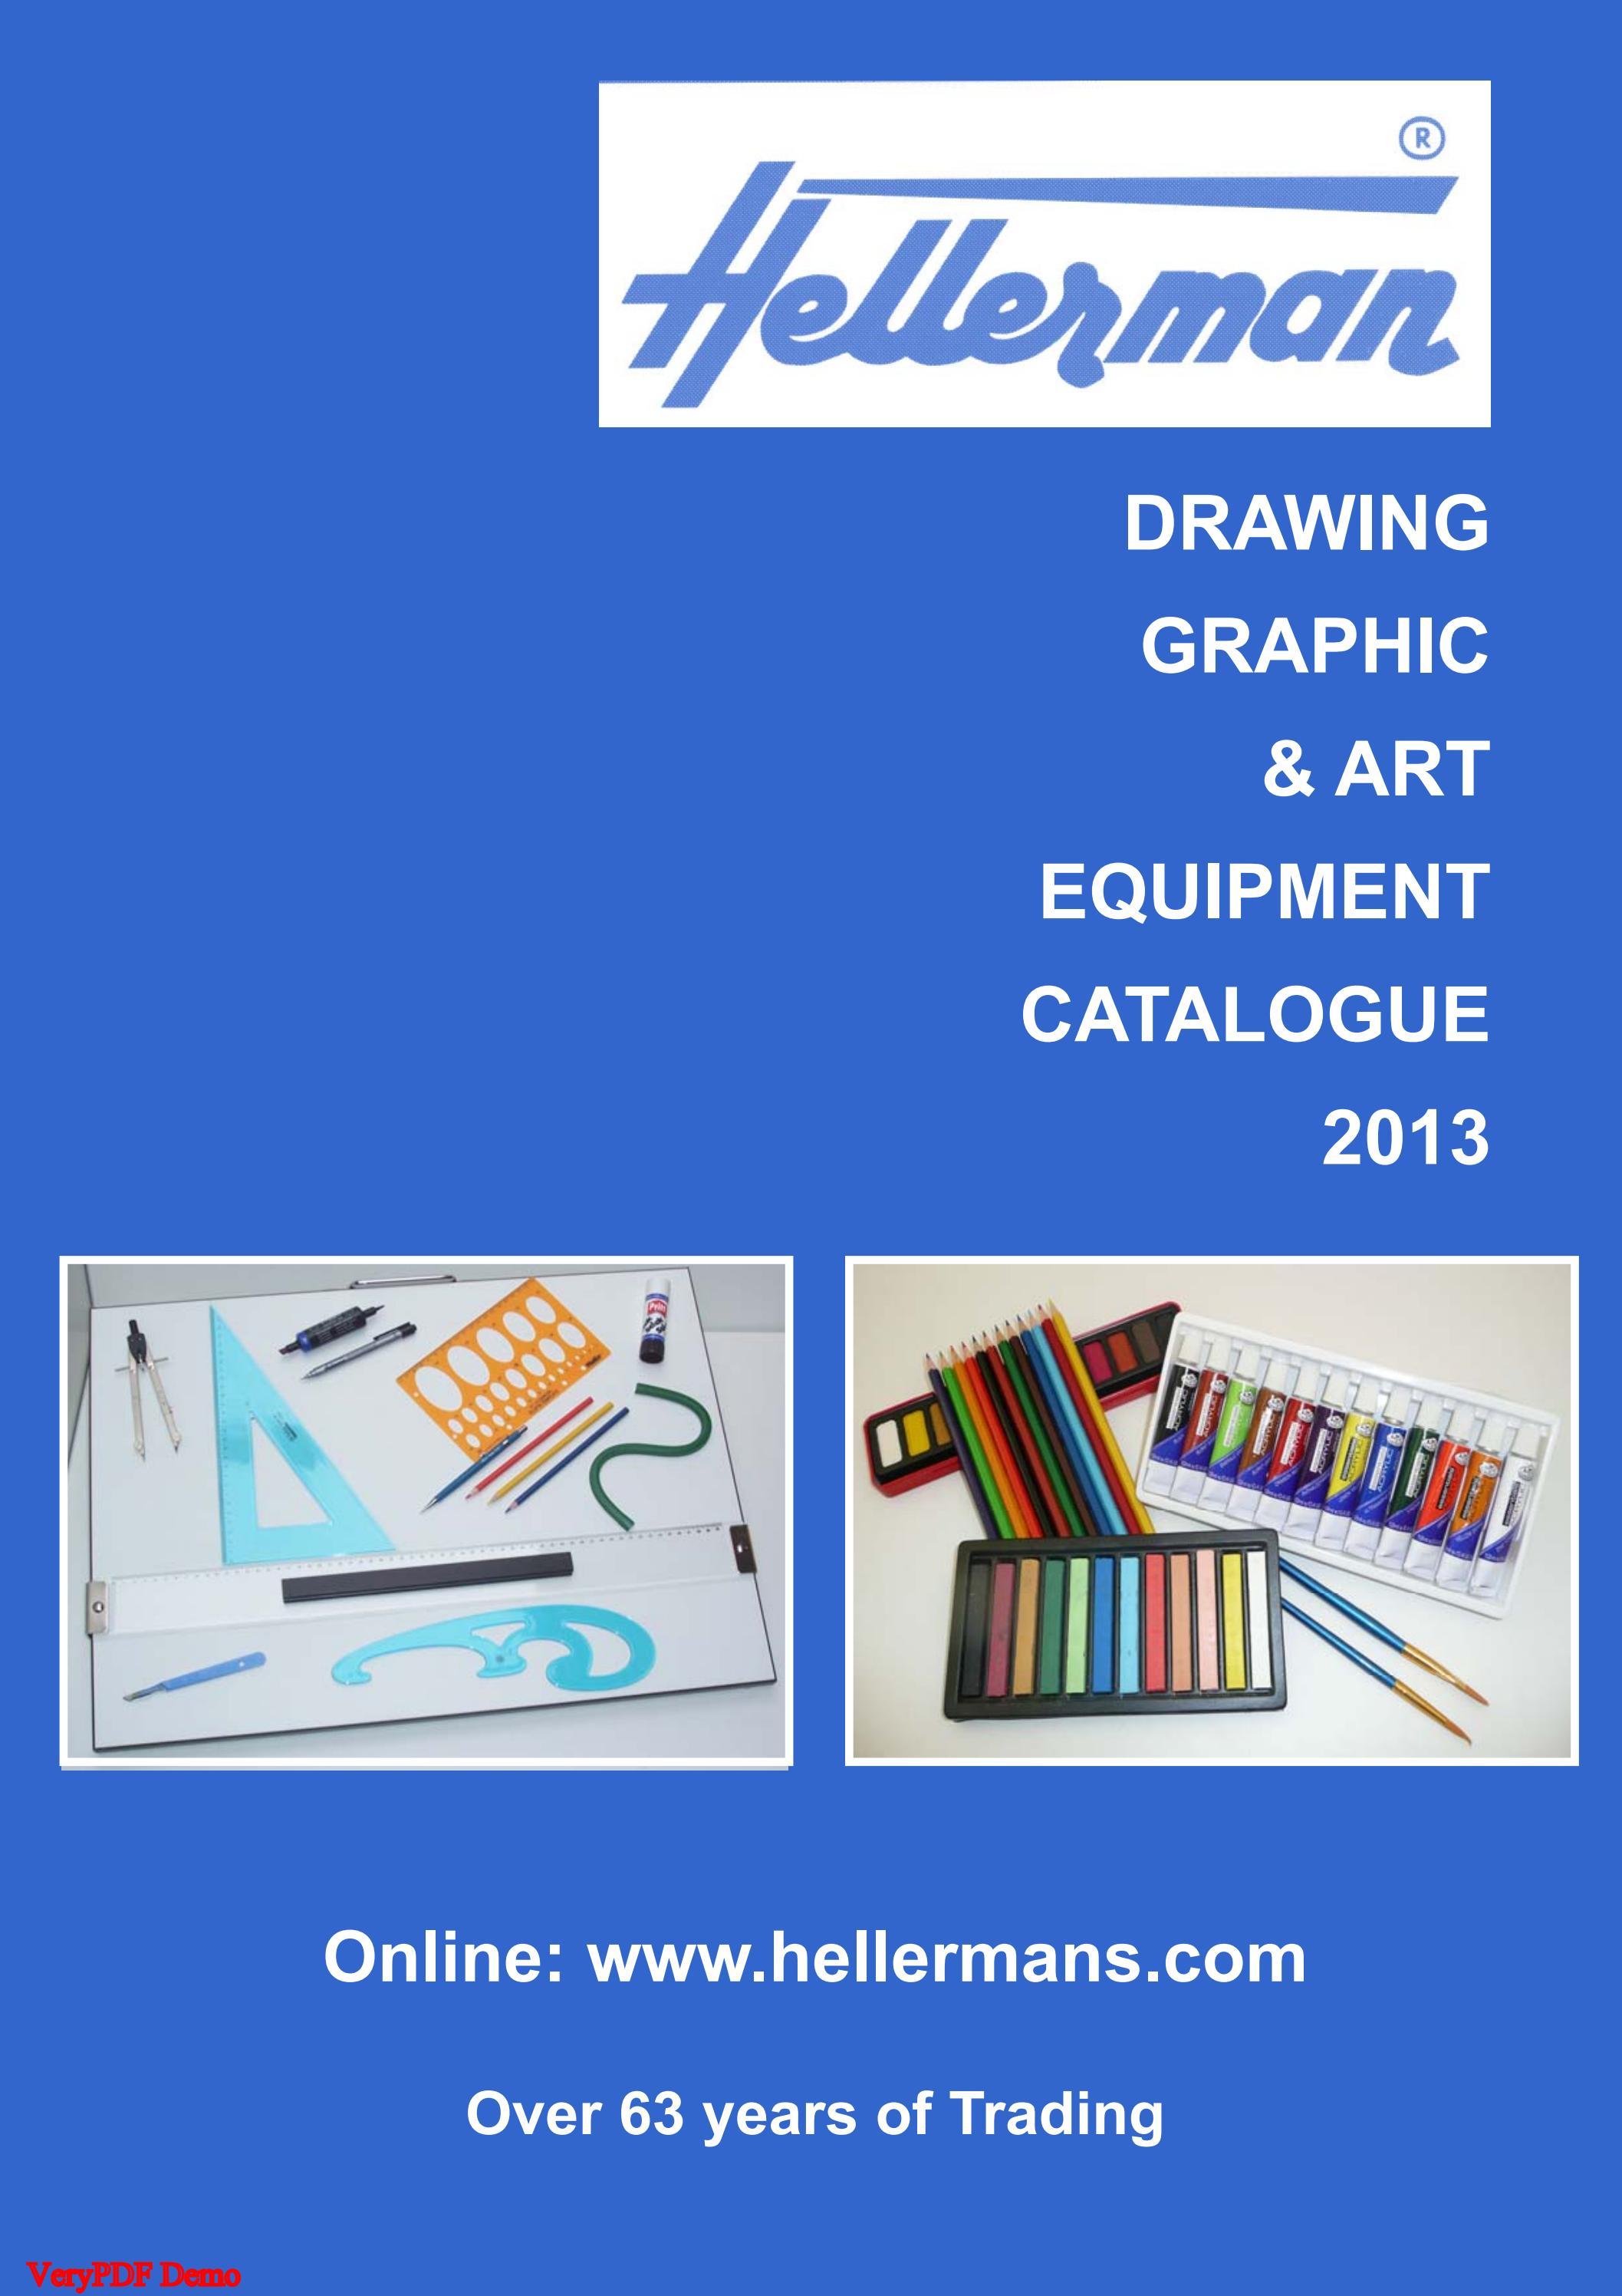 Esmond Hellerman Ltd 2013 Catalogue By Johnathan Fish Issuu Staedtler Triplus Color Fibre Tip Pen 323 34 Aqua Blue